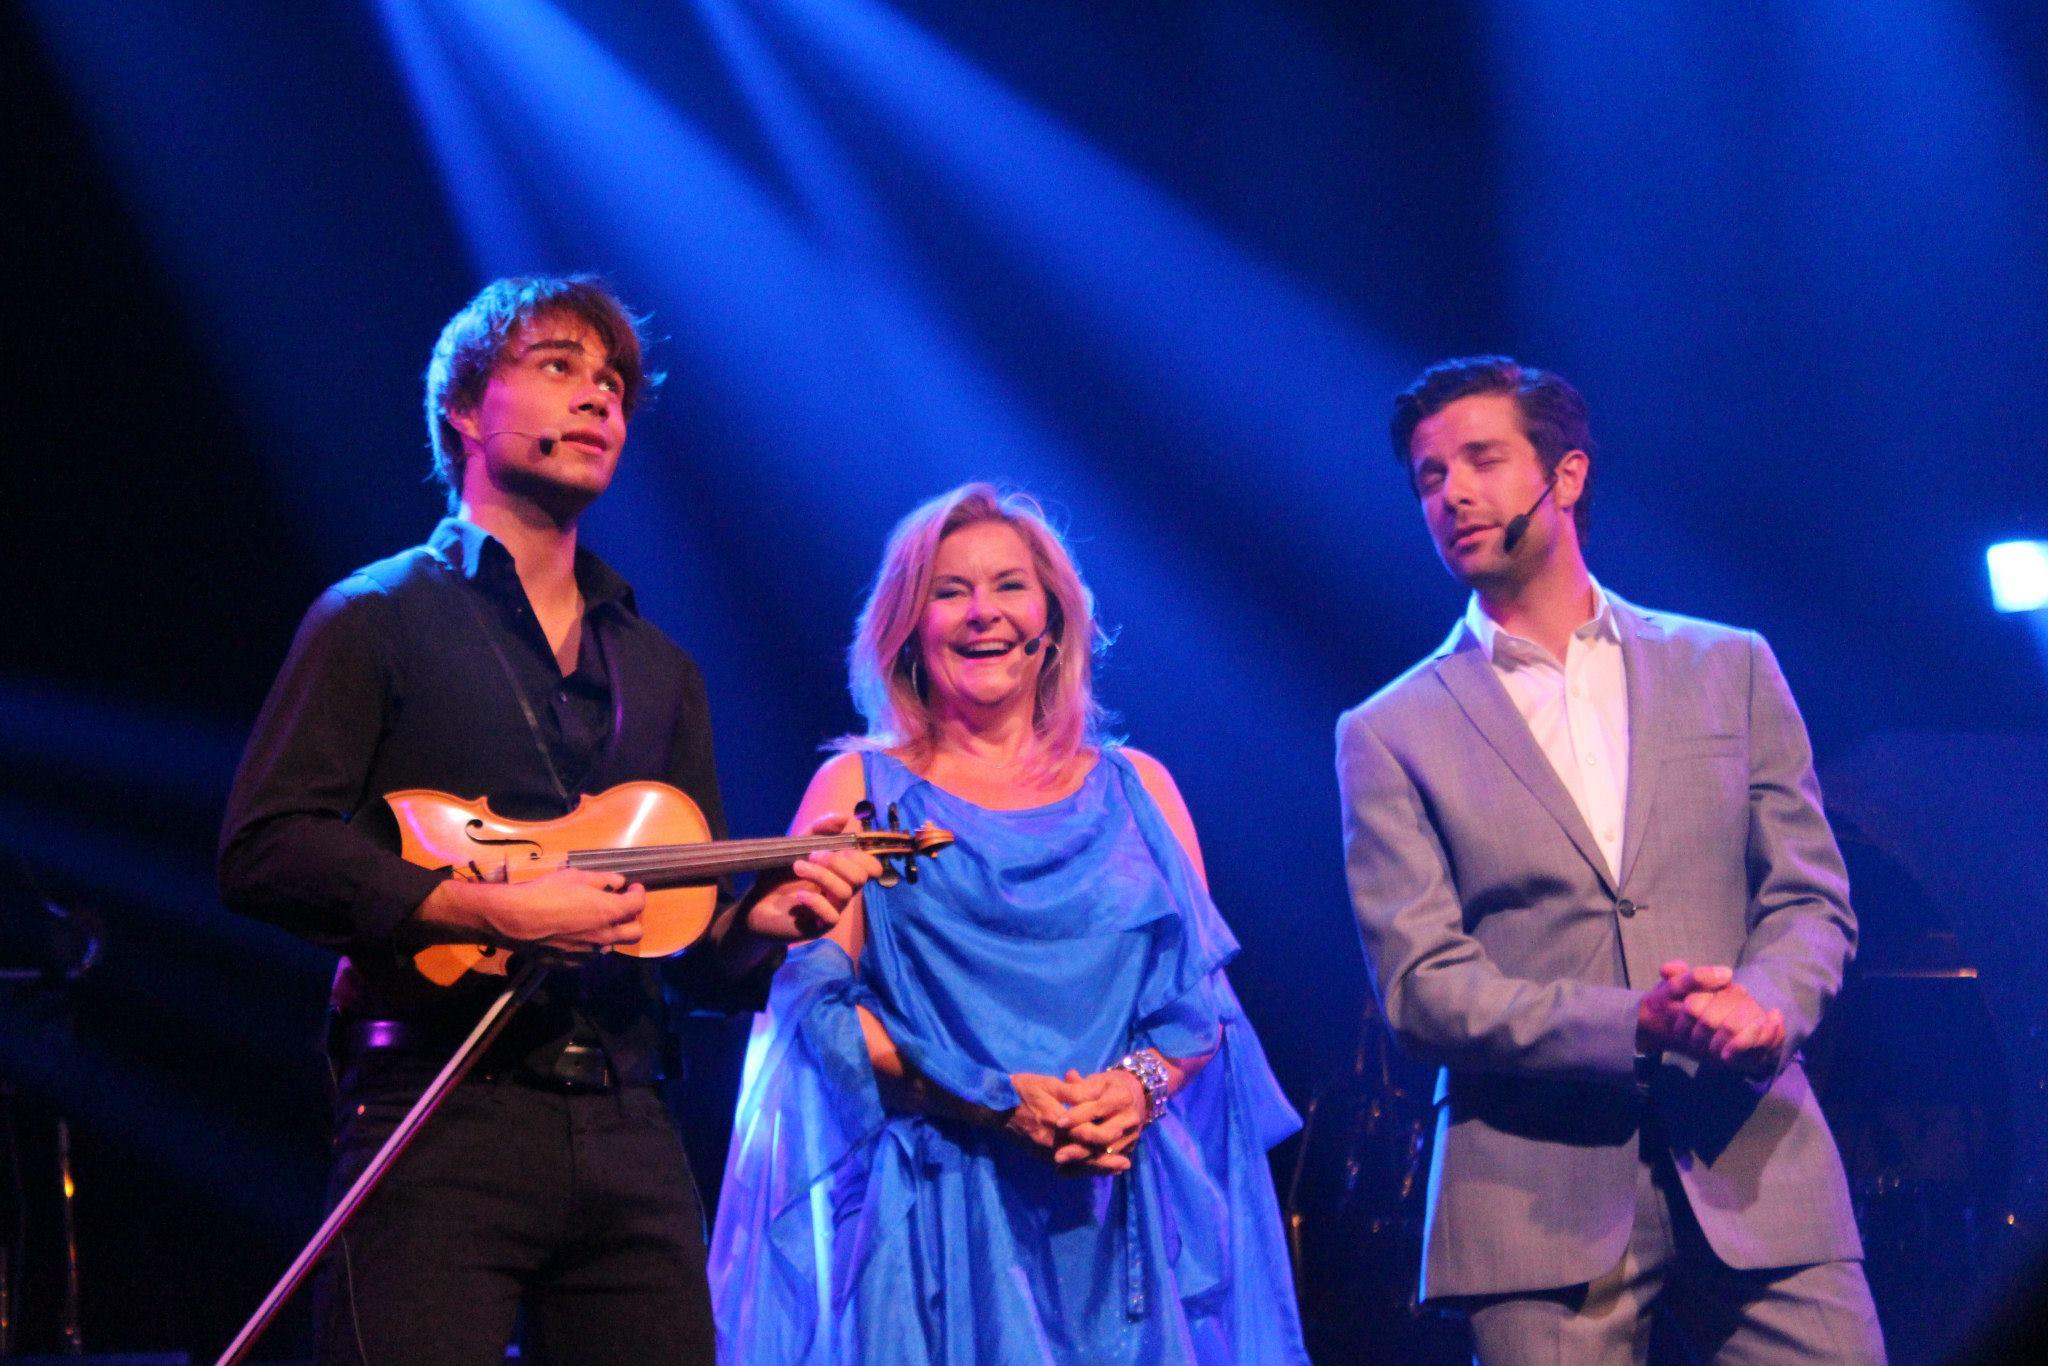 Summer Show 2013, Tønsberg, Norway: Bettan, Alexander and Didrik